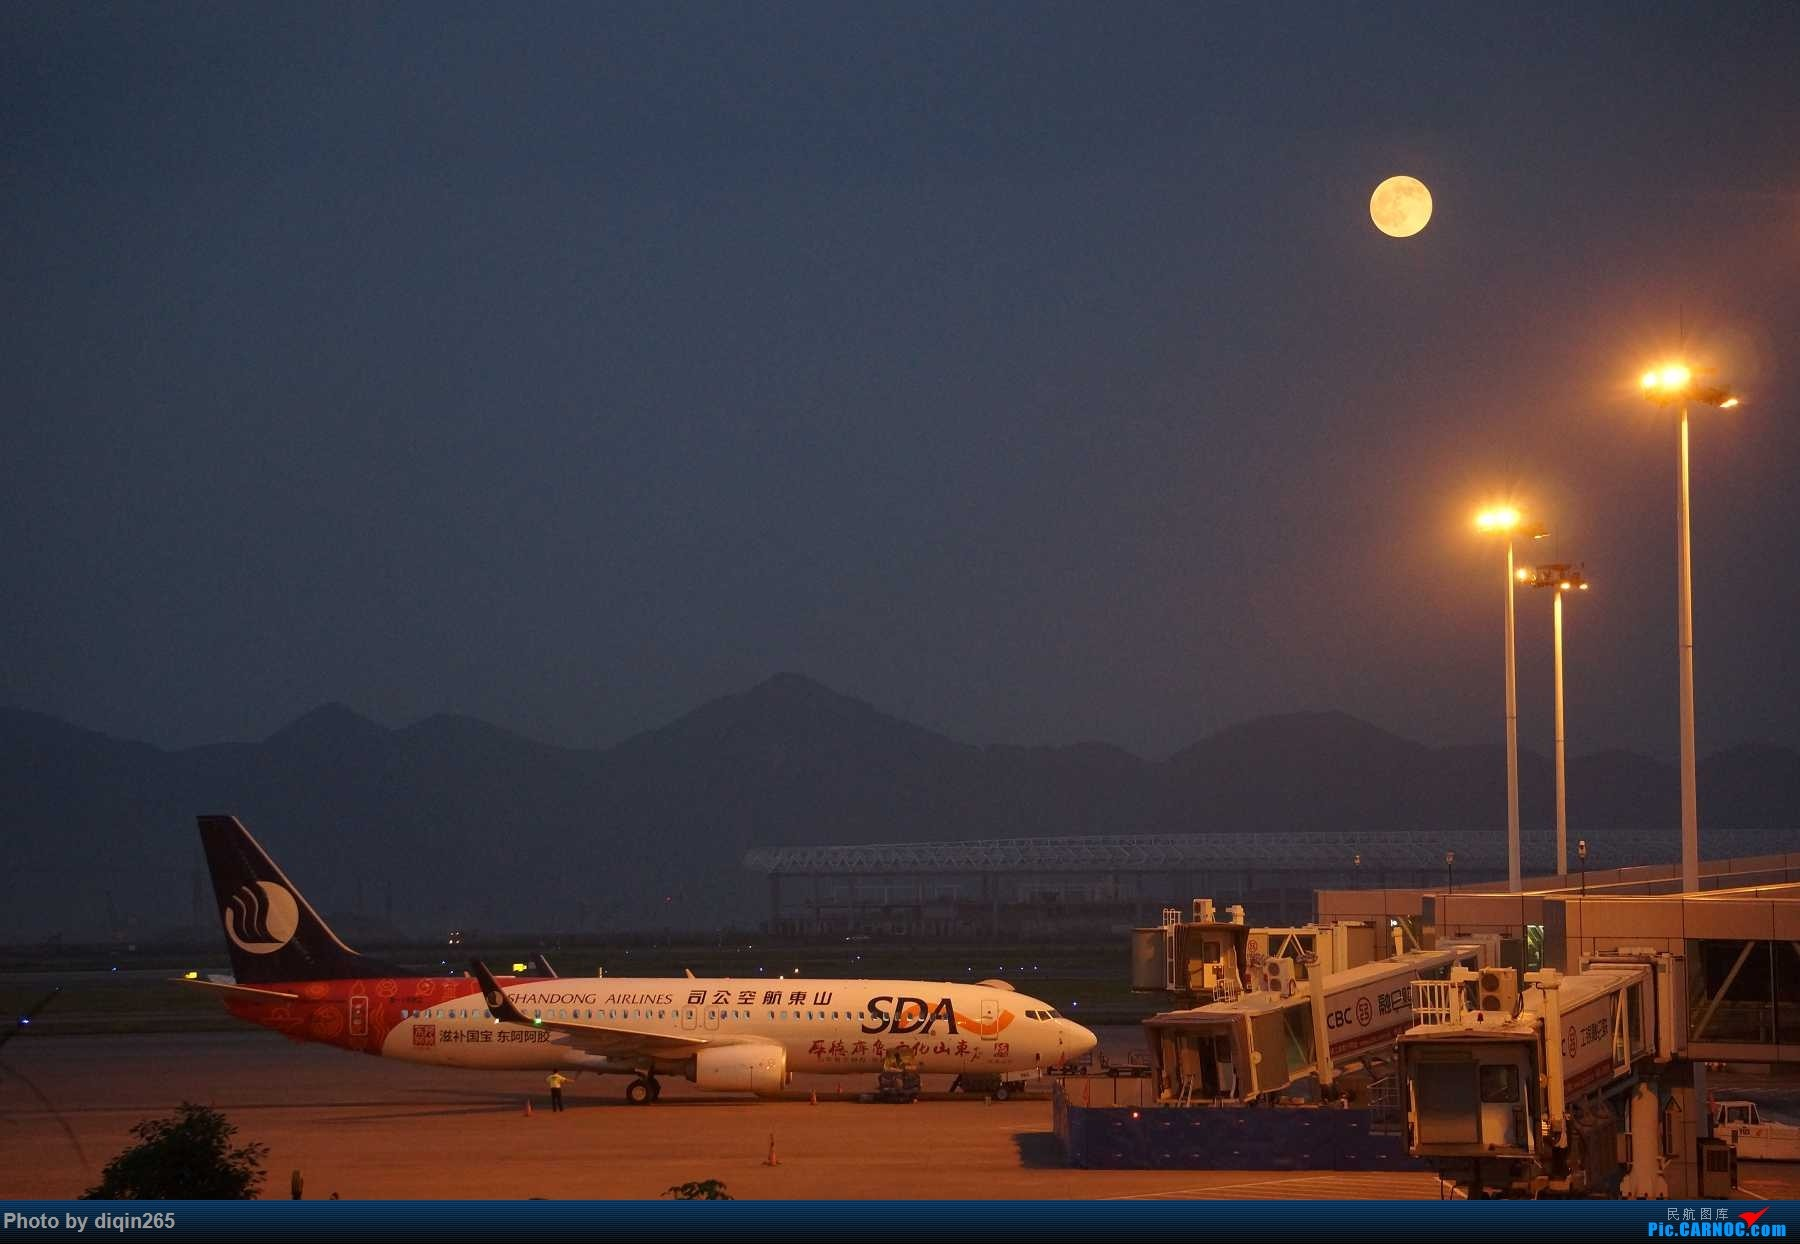 Re:[原创]CKG最近几天拍机现状:天气好 人受罪 心敞亮 BOEING 737-800 B-1982 中国重庆江北国际机场